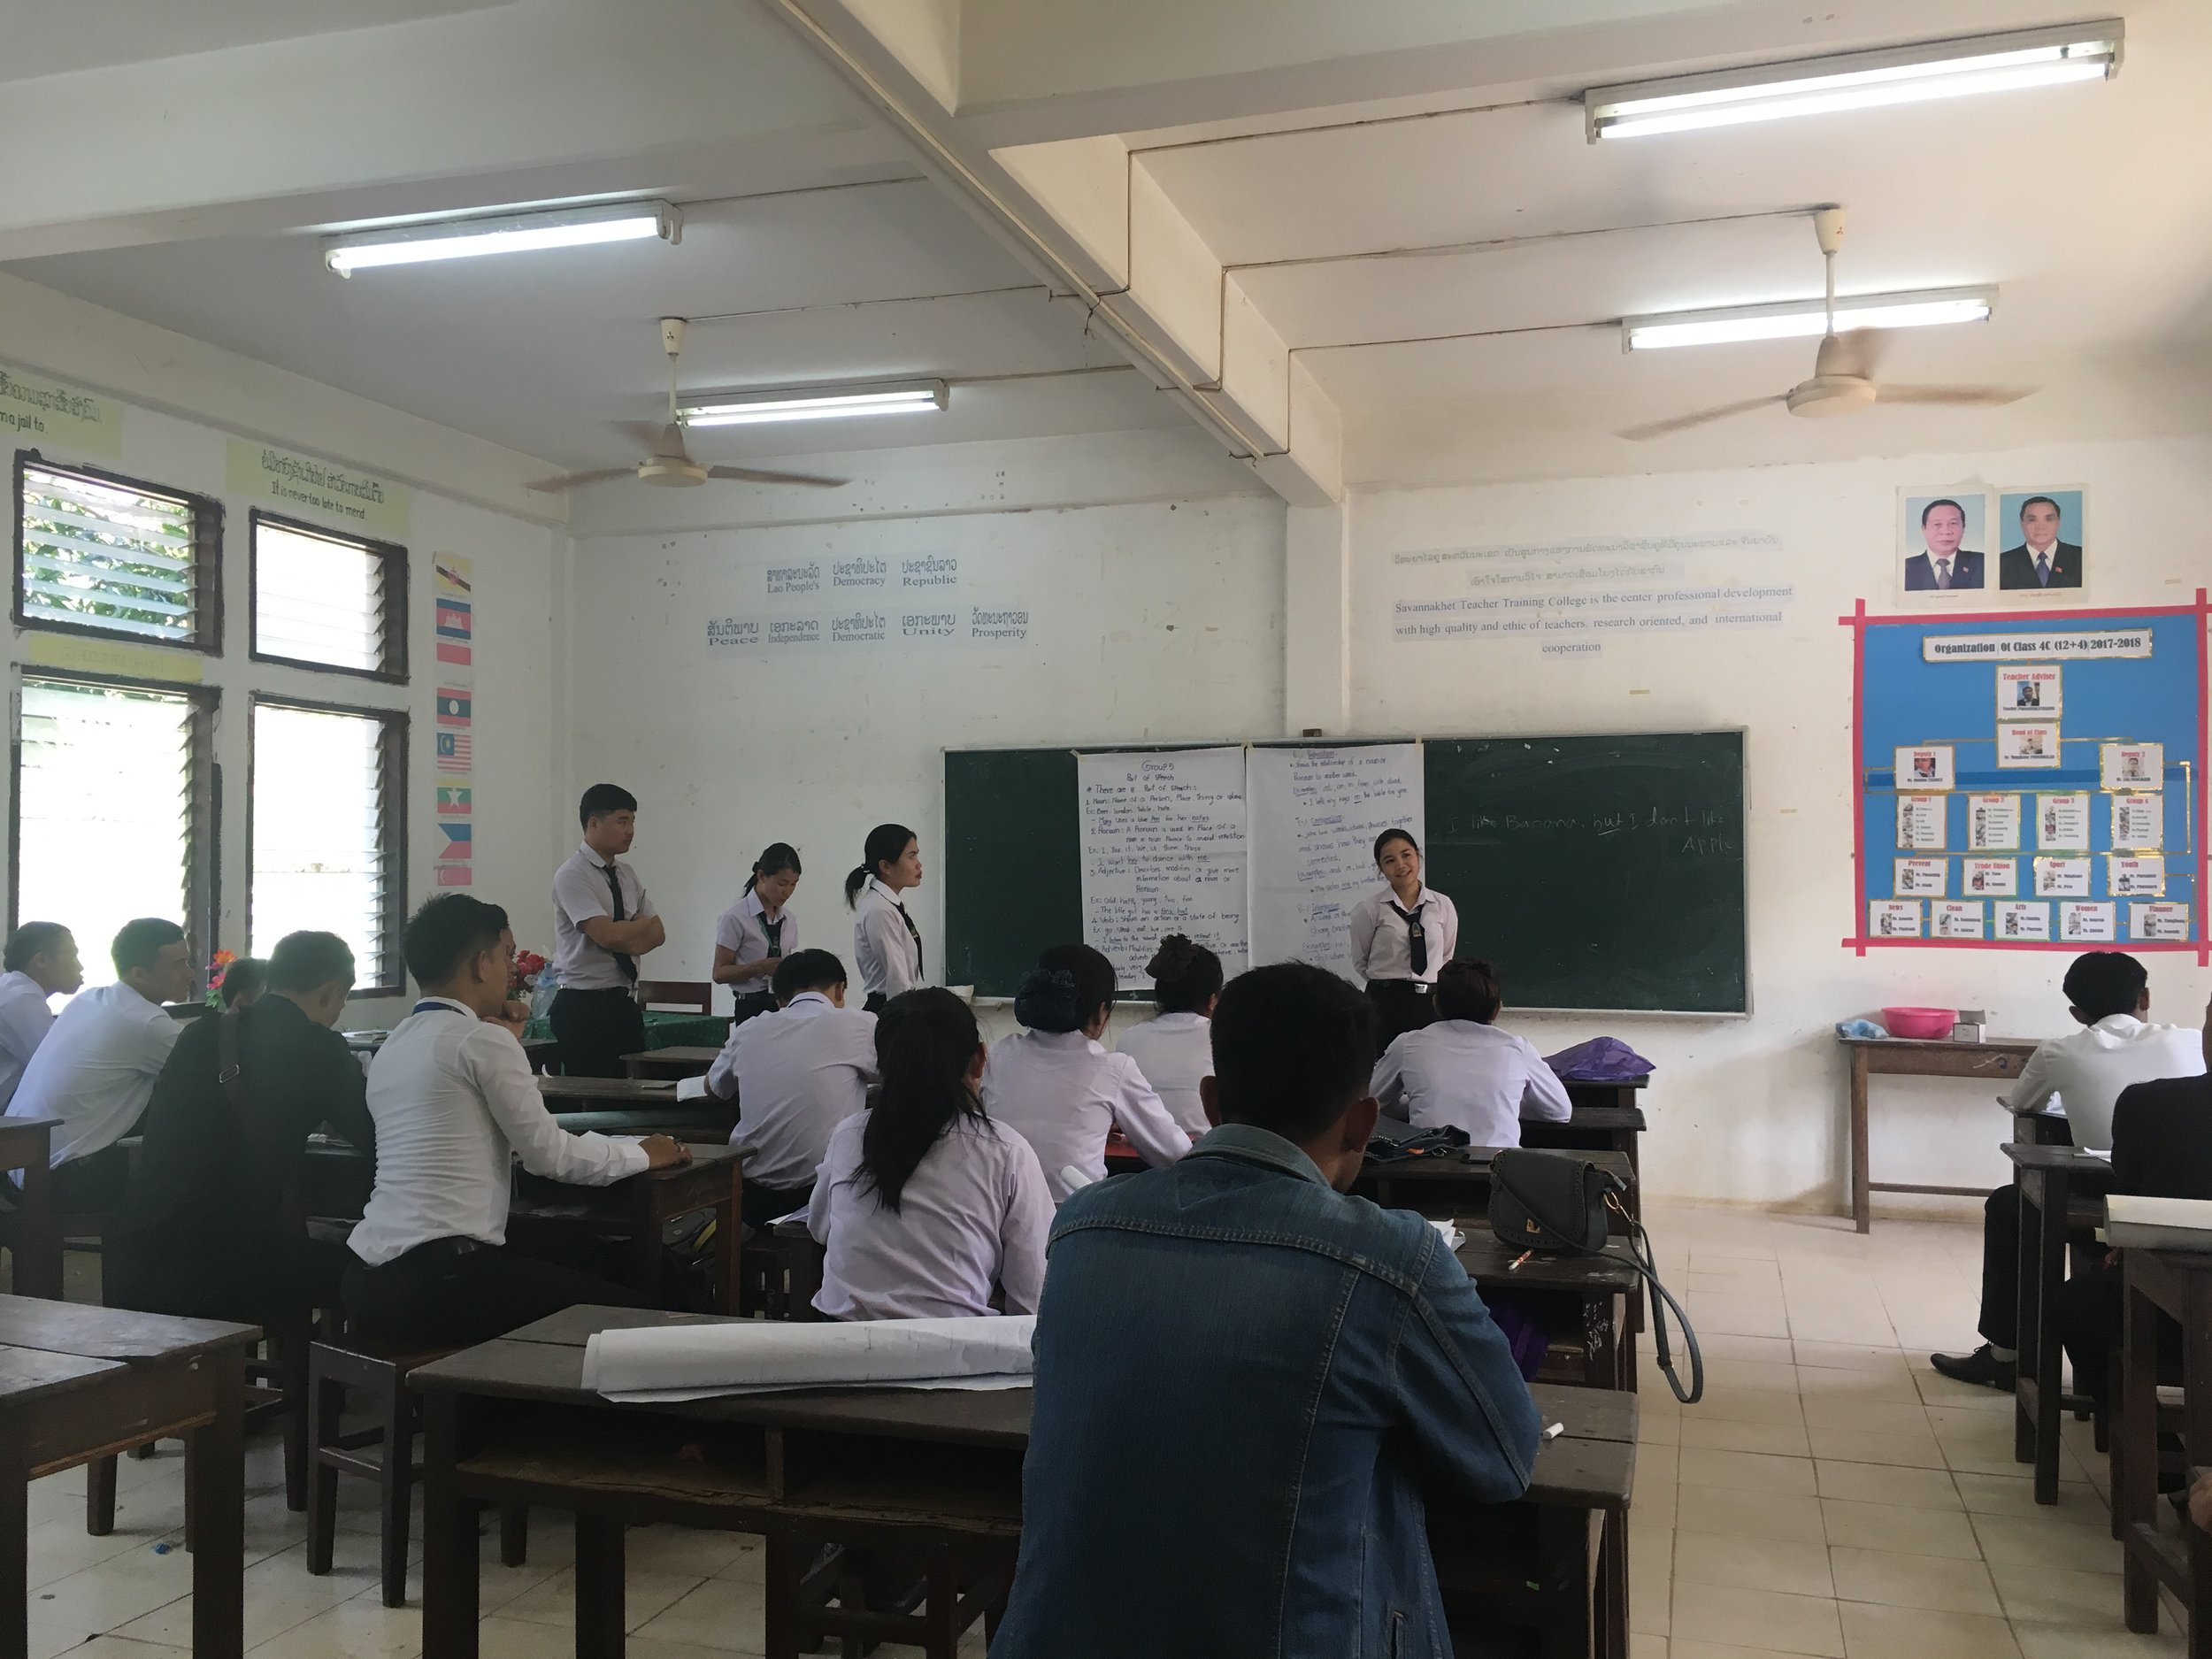 My classroom in Laos